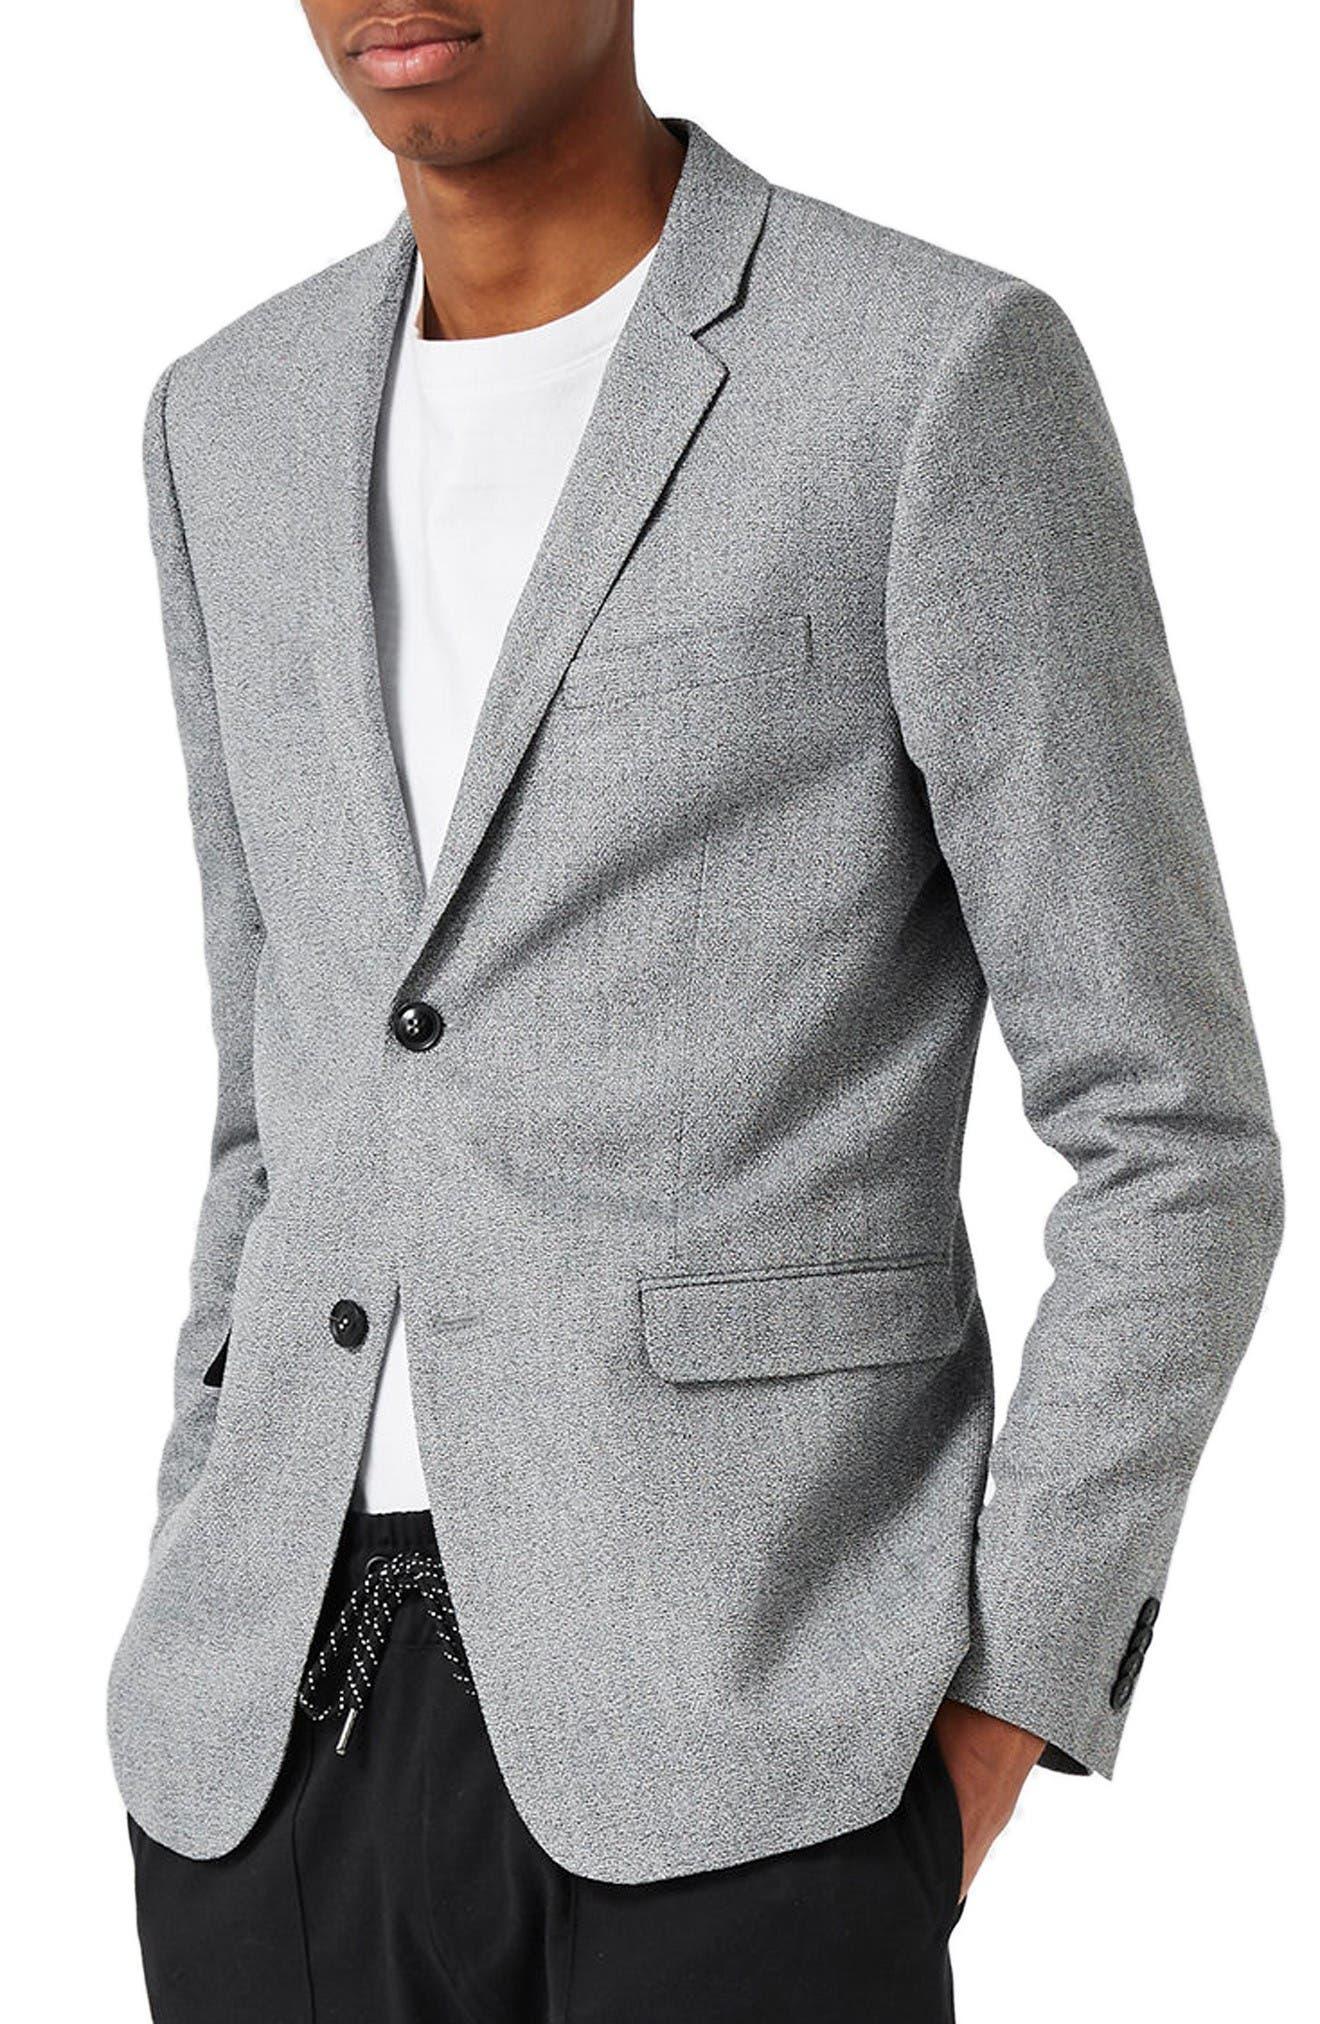 Topman Crossweave Texture Skinny Fit Sport Coat